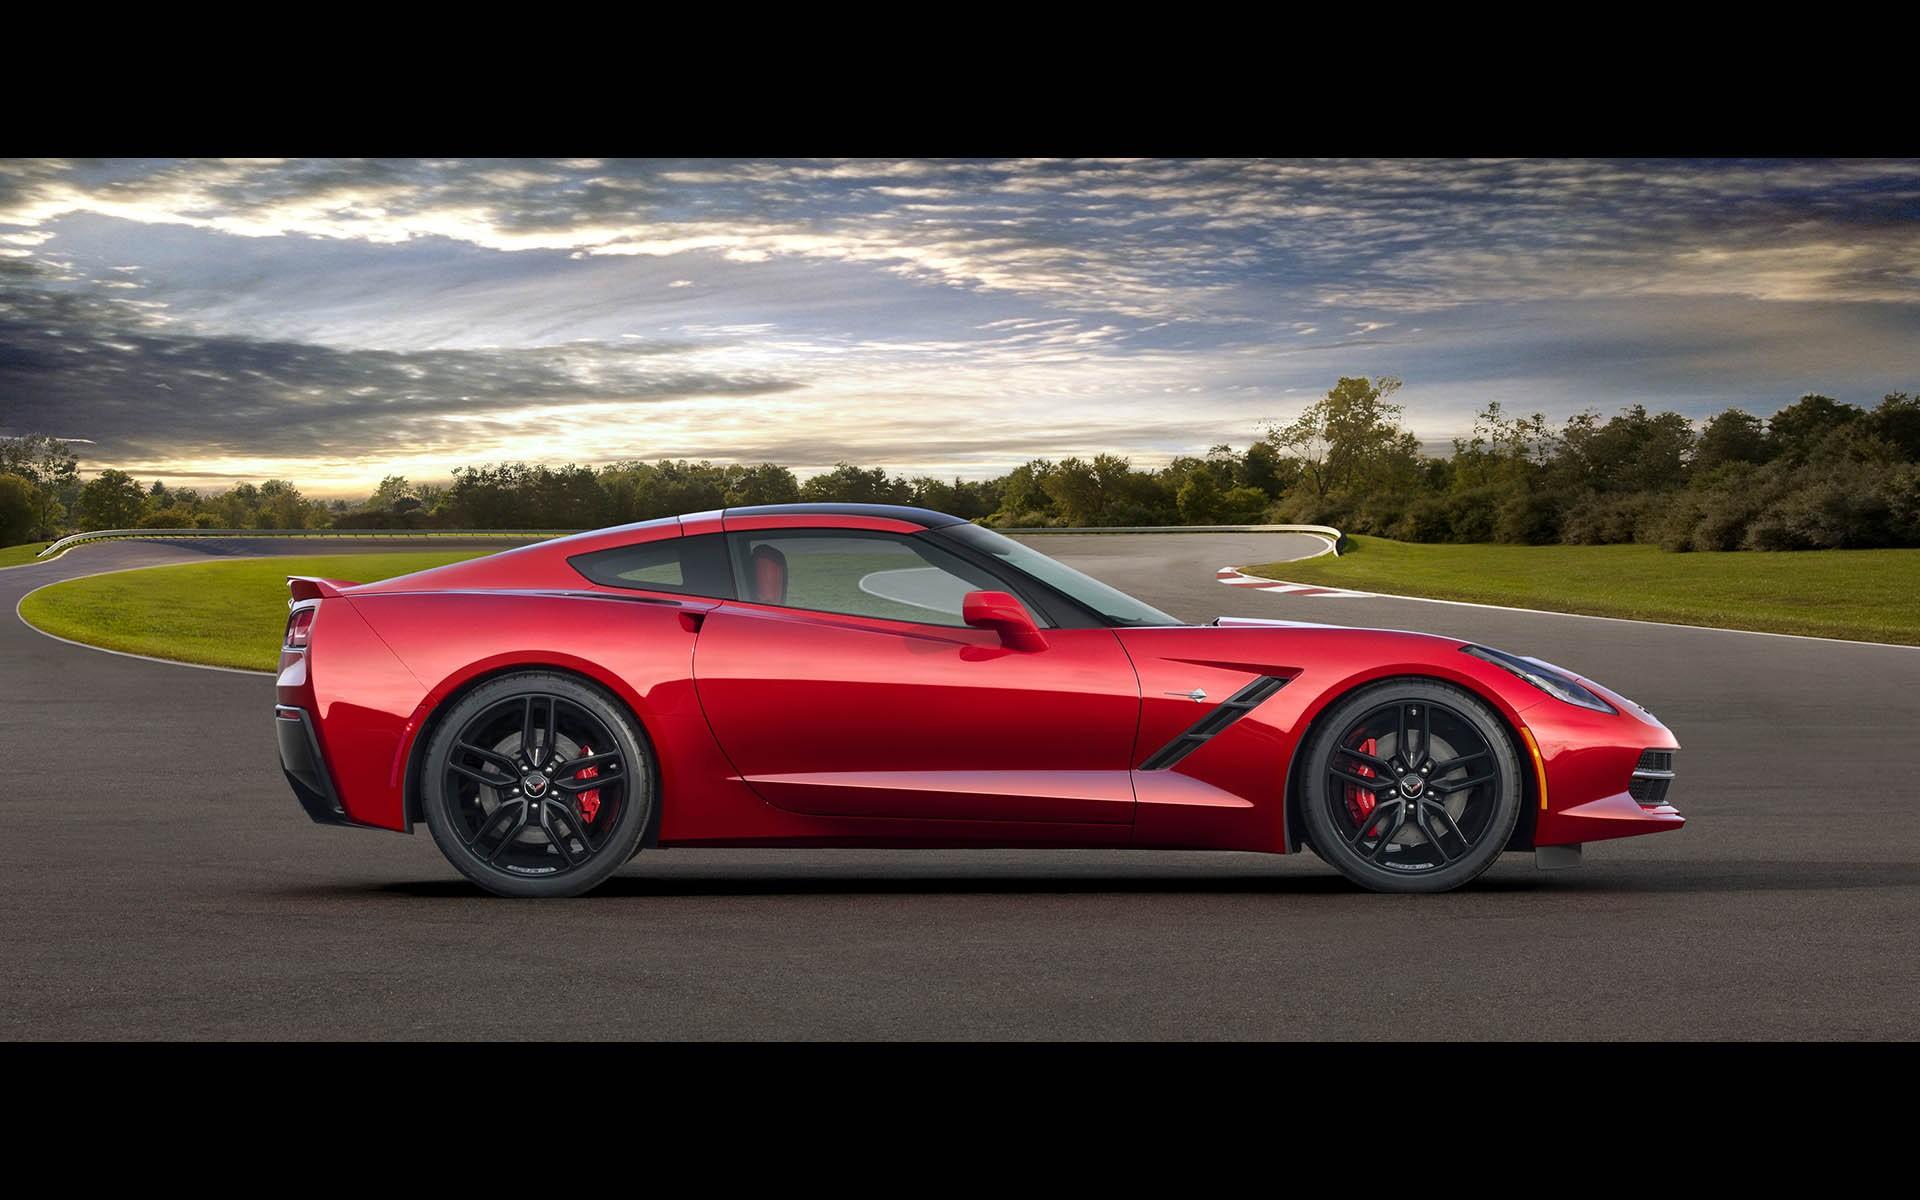 Corvette c7 2014 high definition wallpapers